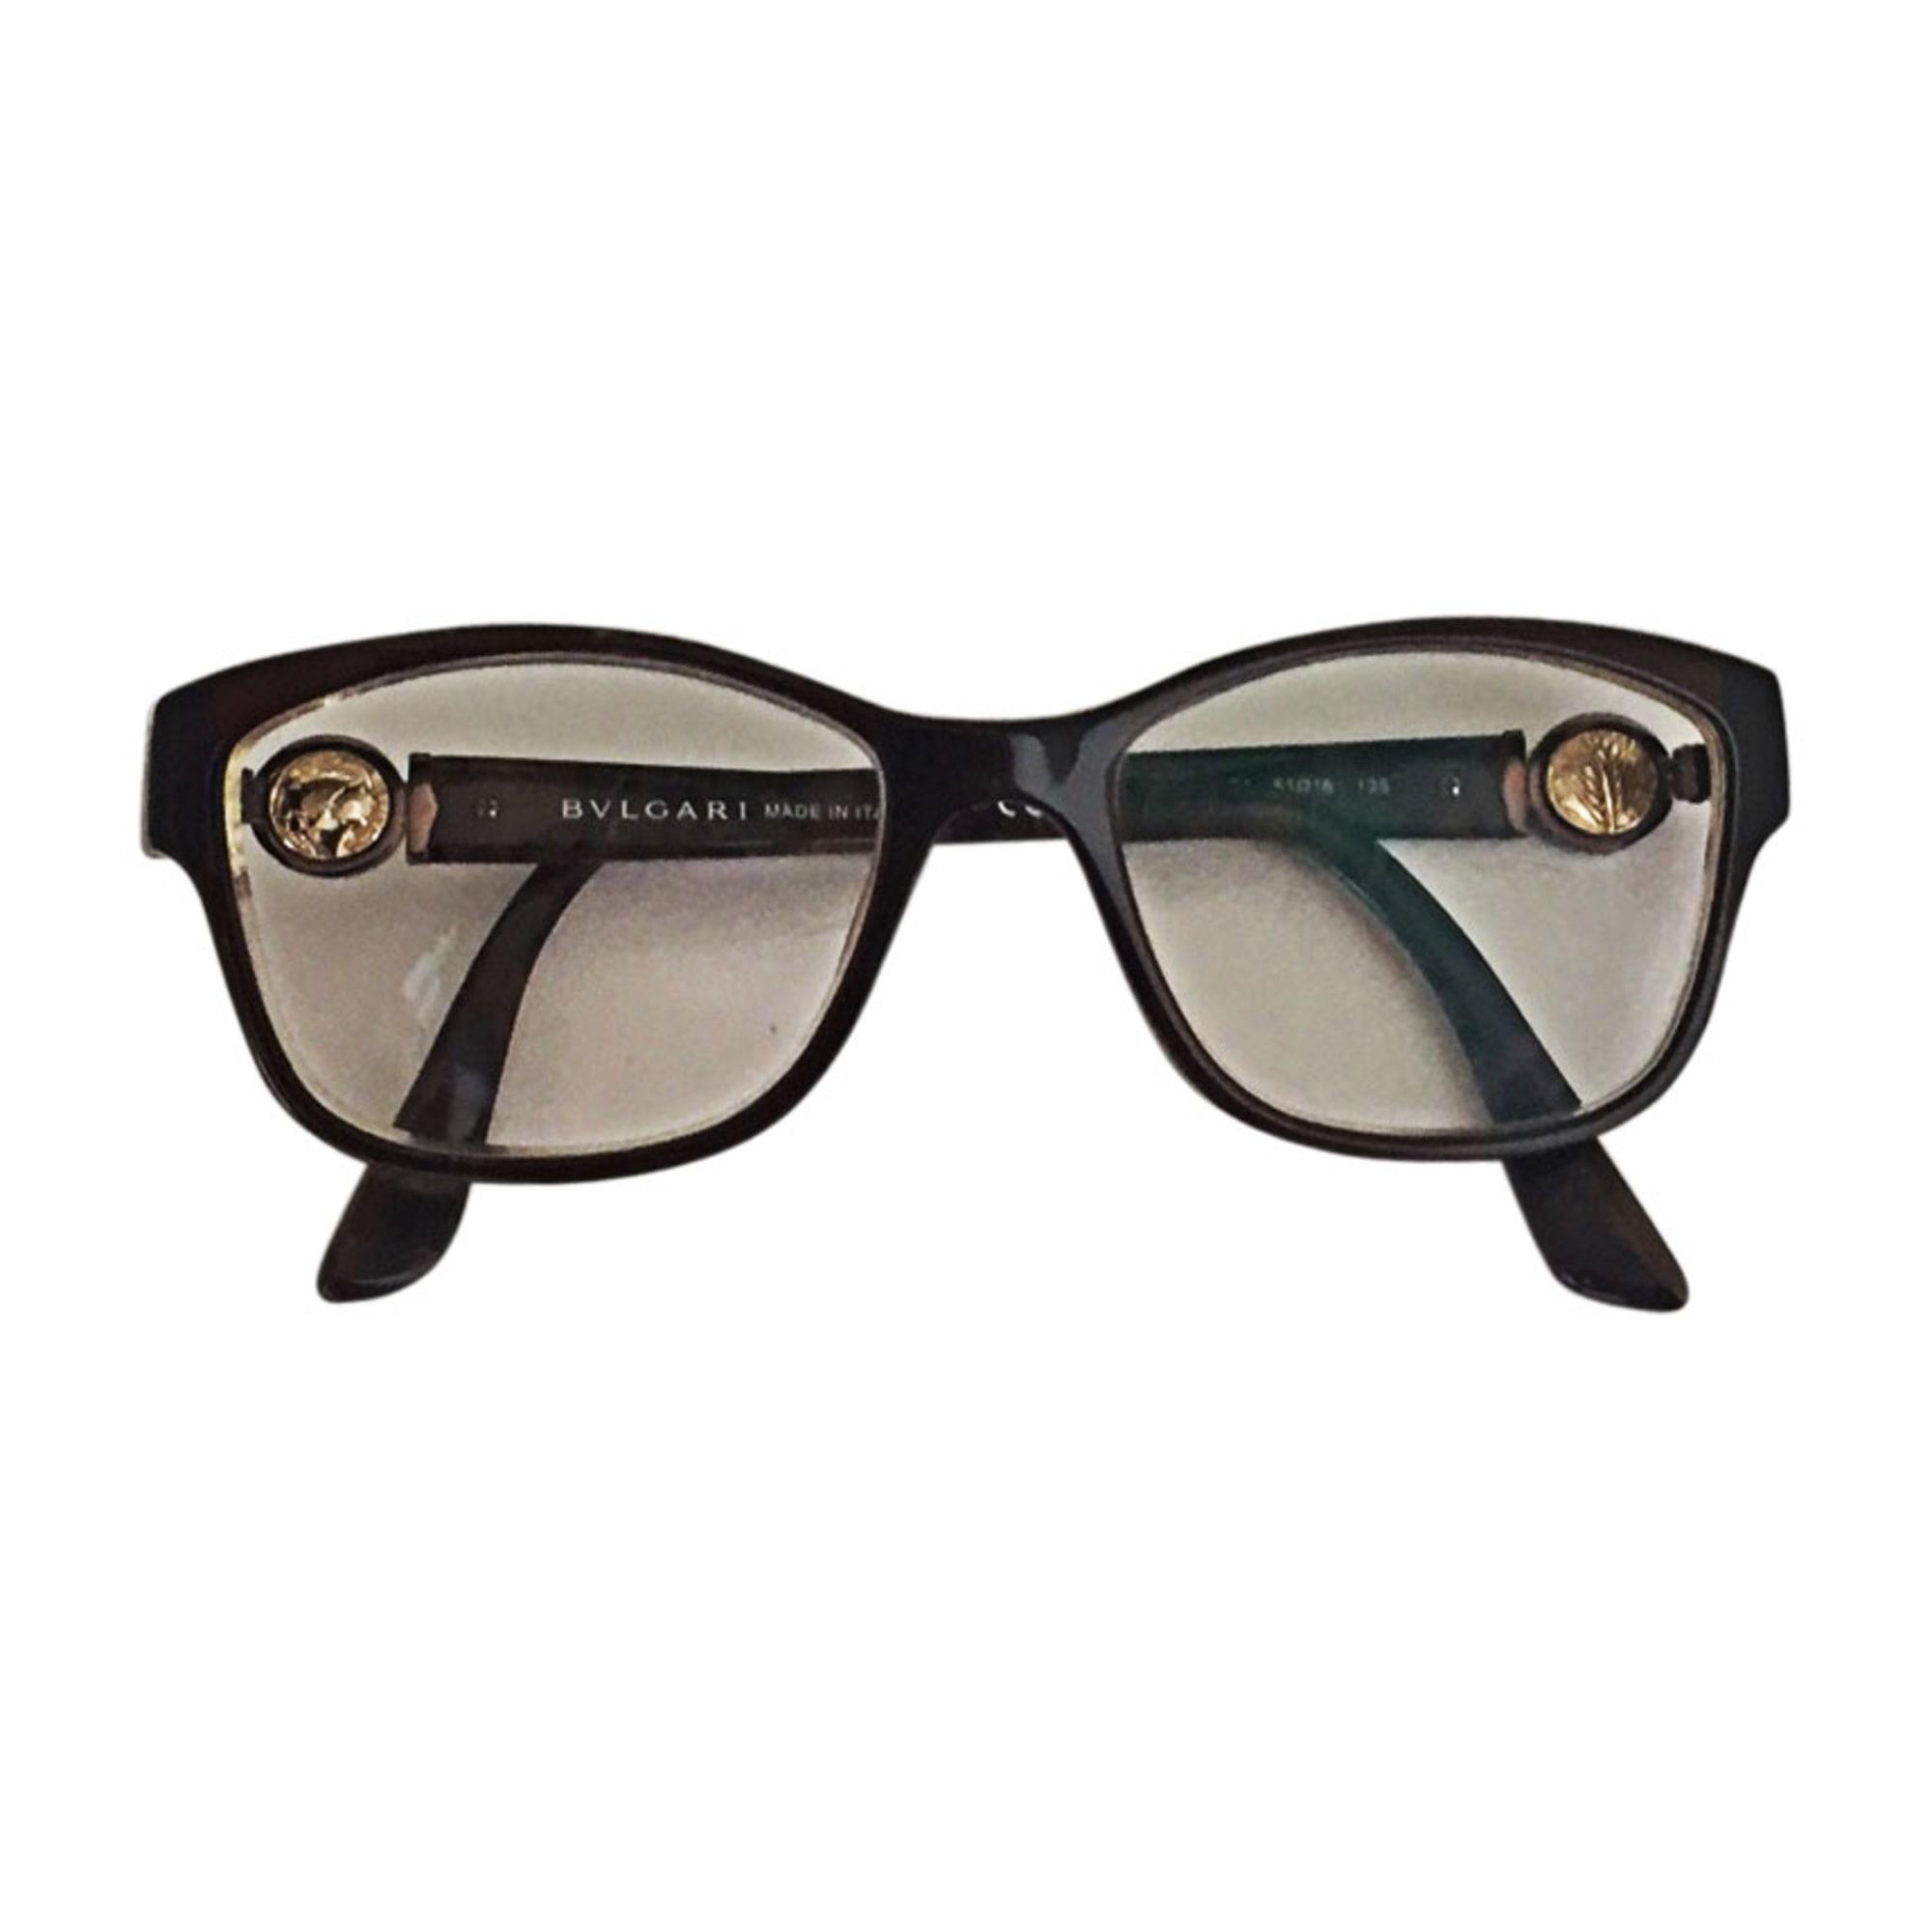 e7ab8b3216c Monture de lunettes BULGARI marron - 7607730